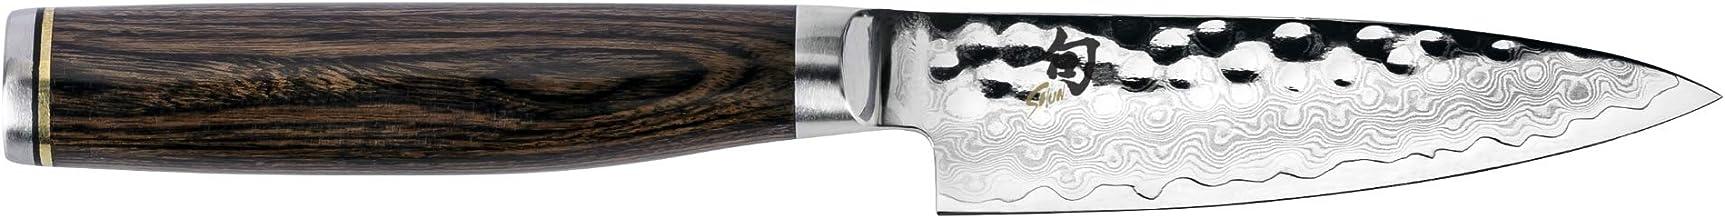 Shun Premier Paring Knife, 4-inches